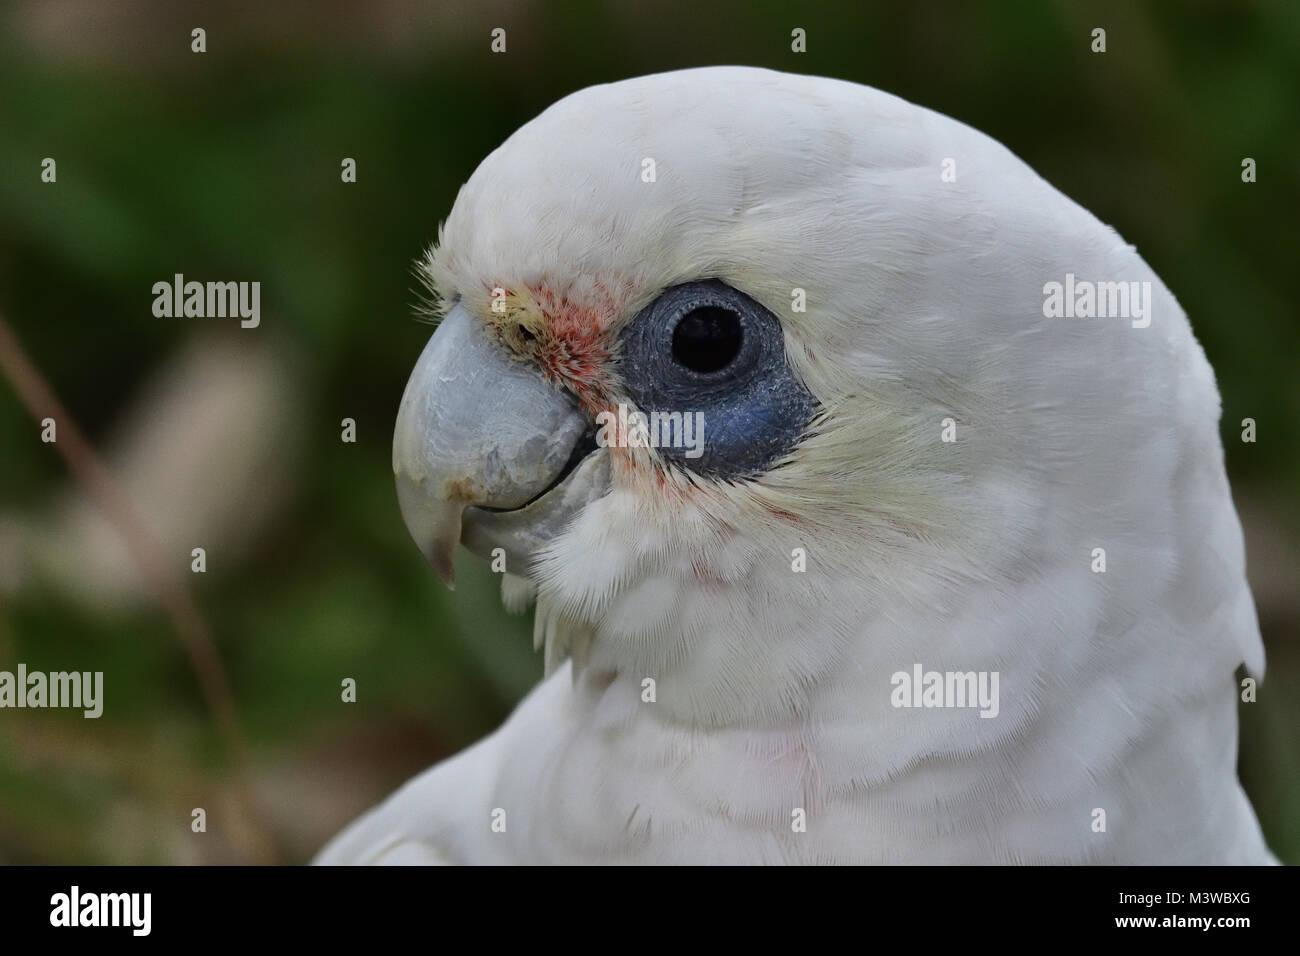 An Australian Little Corella close-up - Stock Image